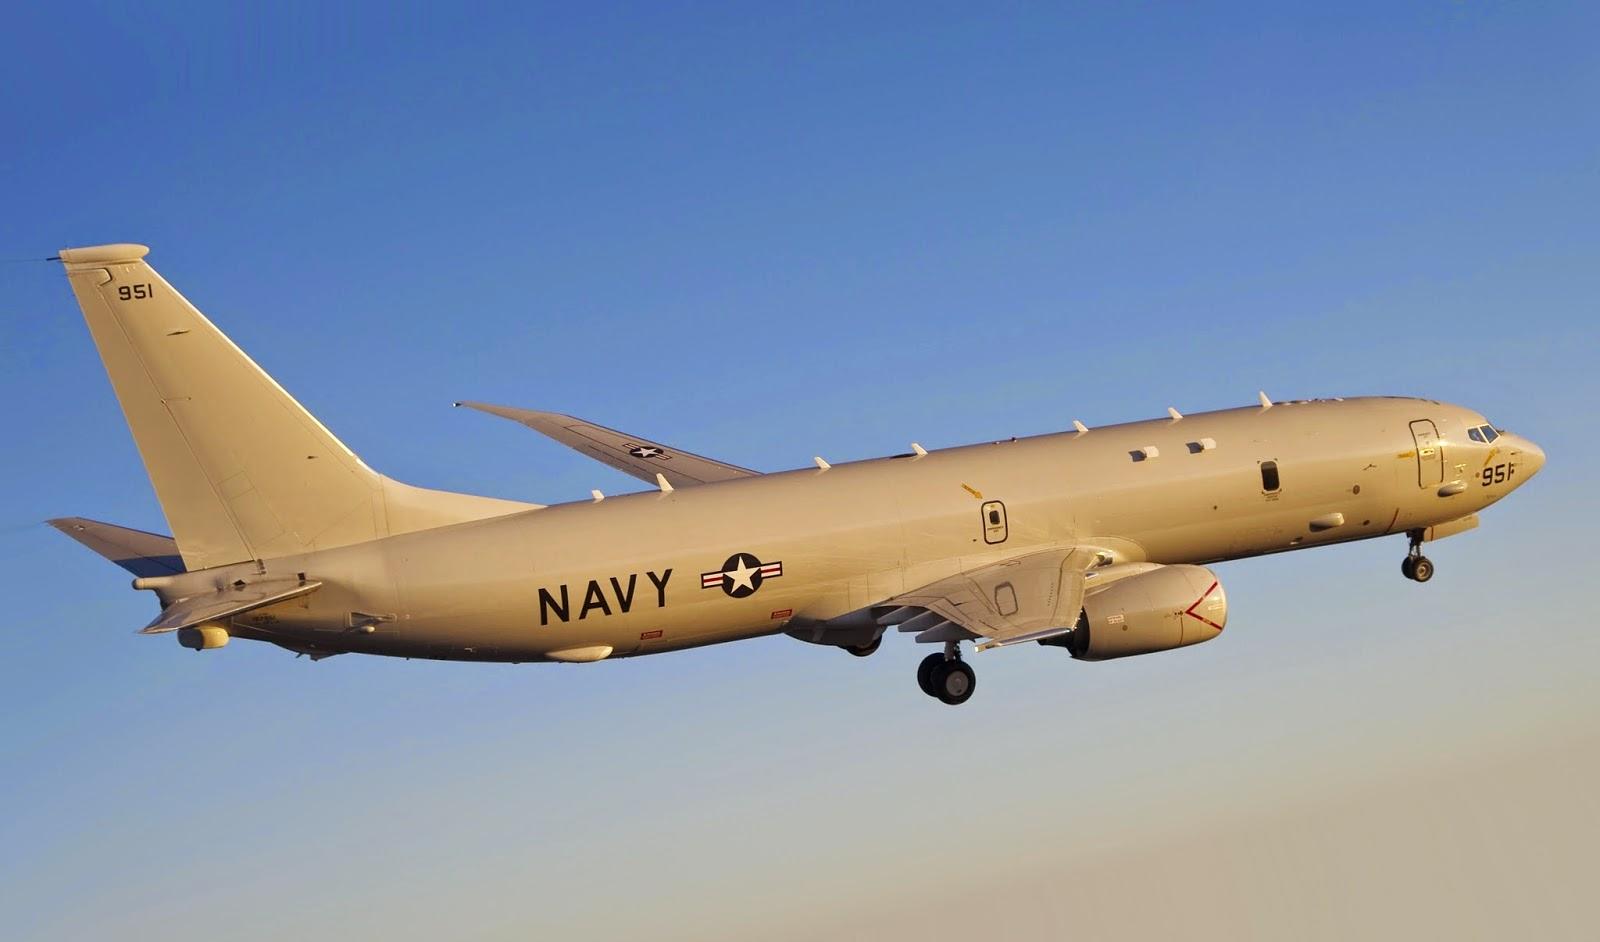 U.S P-8 Poseidon spy plane